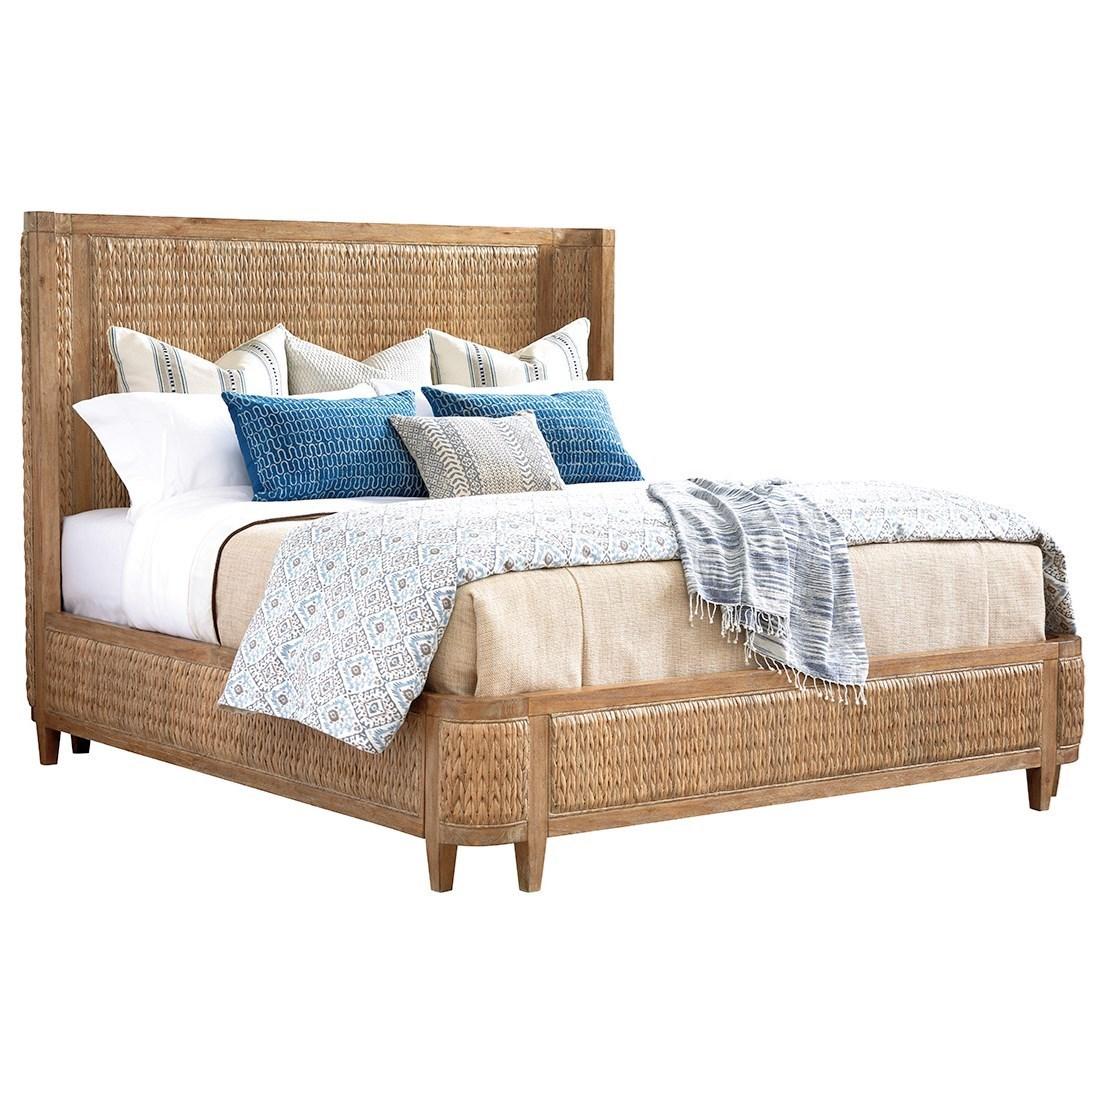 Los Altos Ivory Coast Woven Bed 6/6 King by Tommy Bahama Home at Johnny Janosik